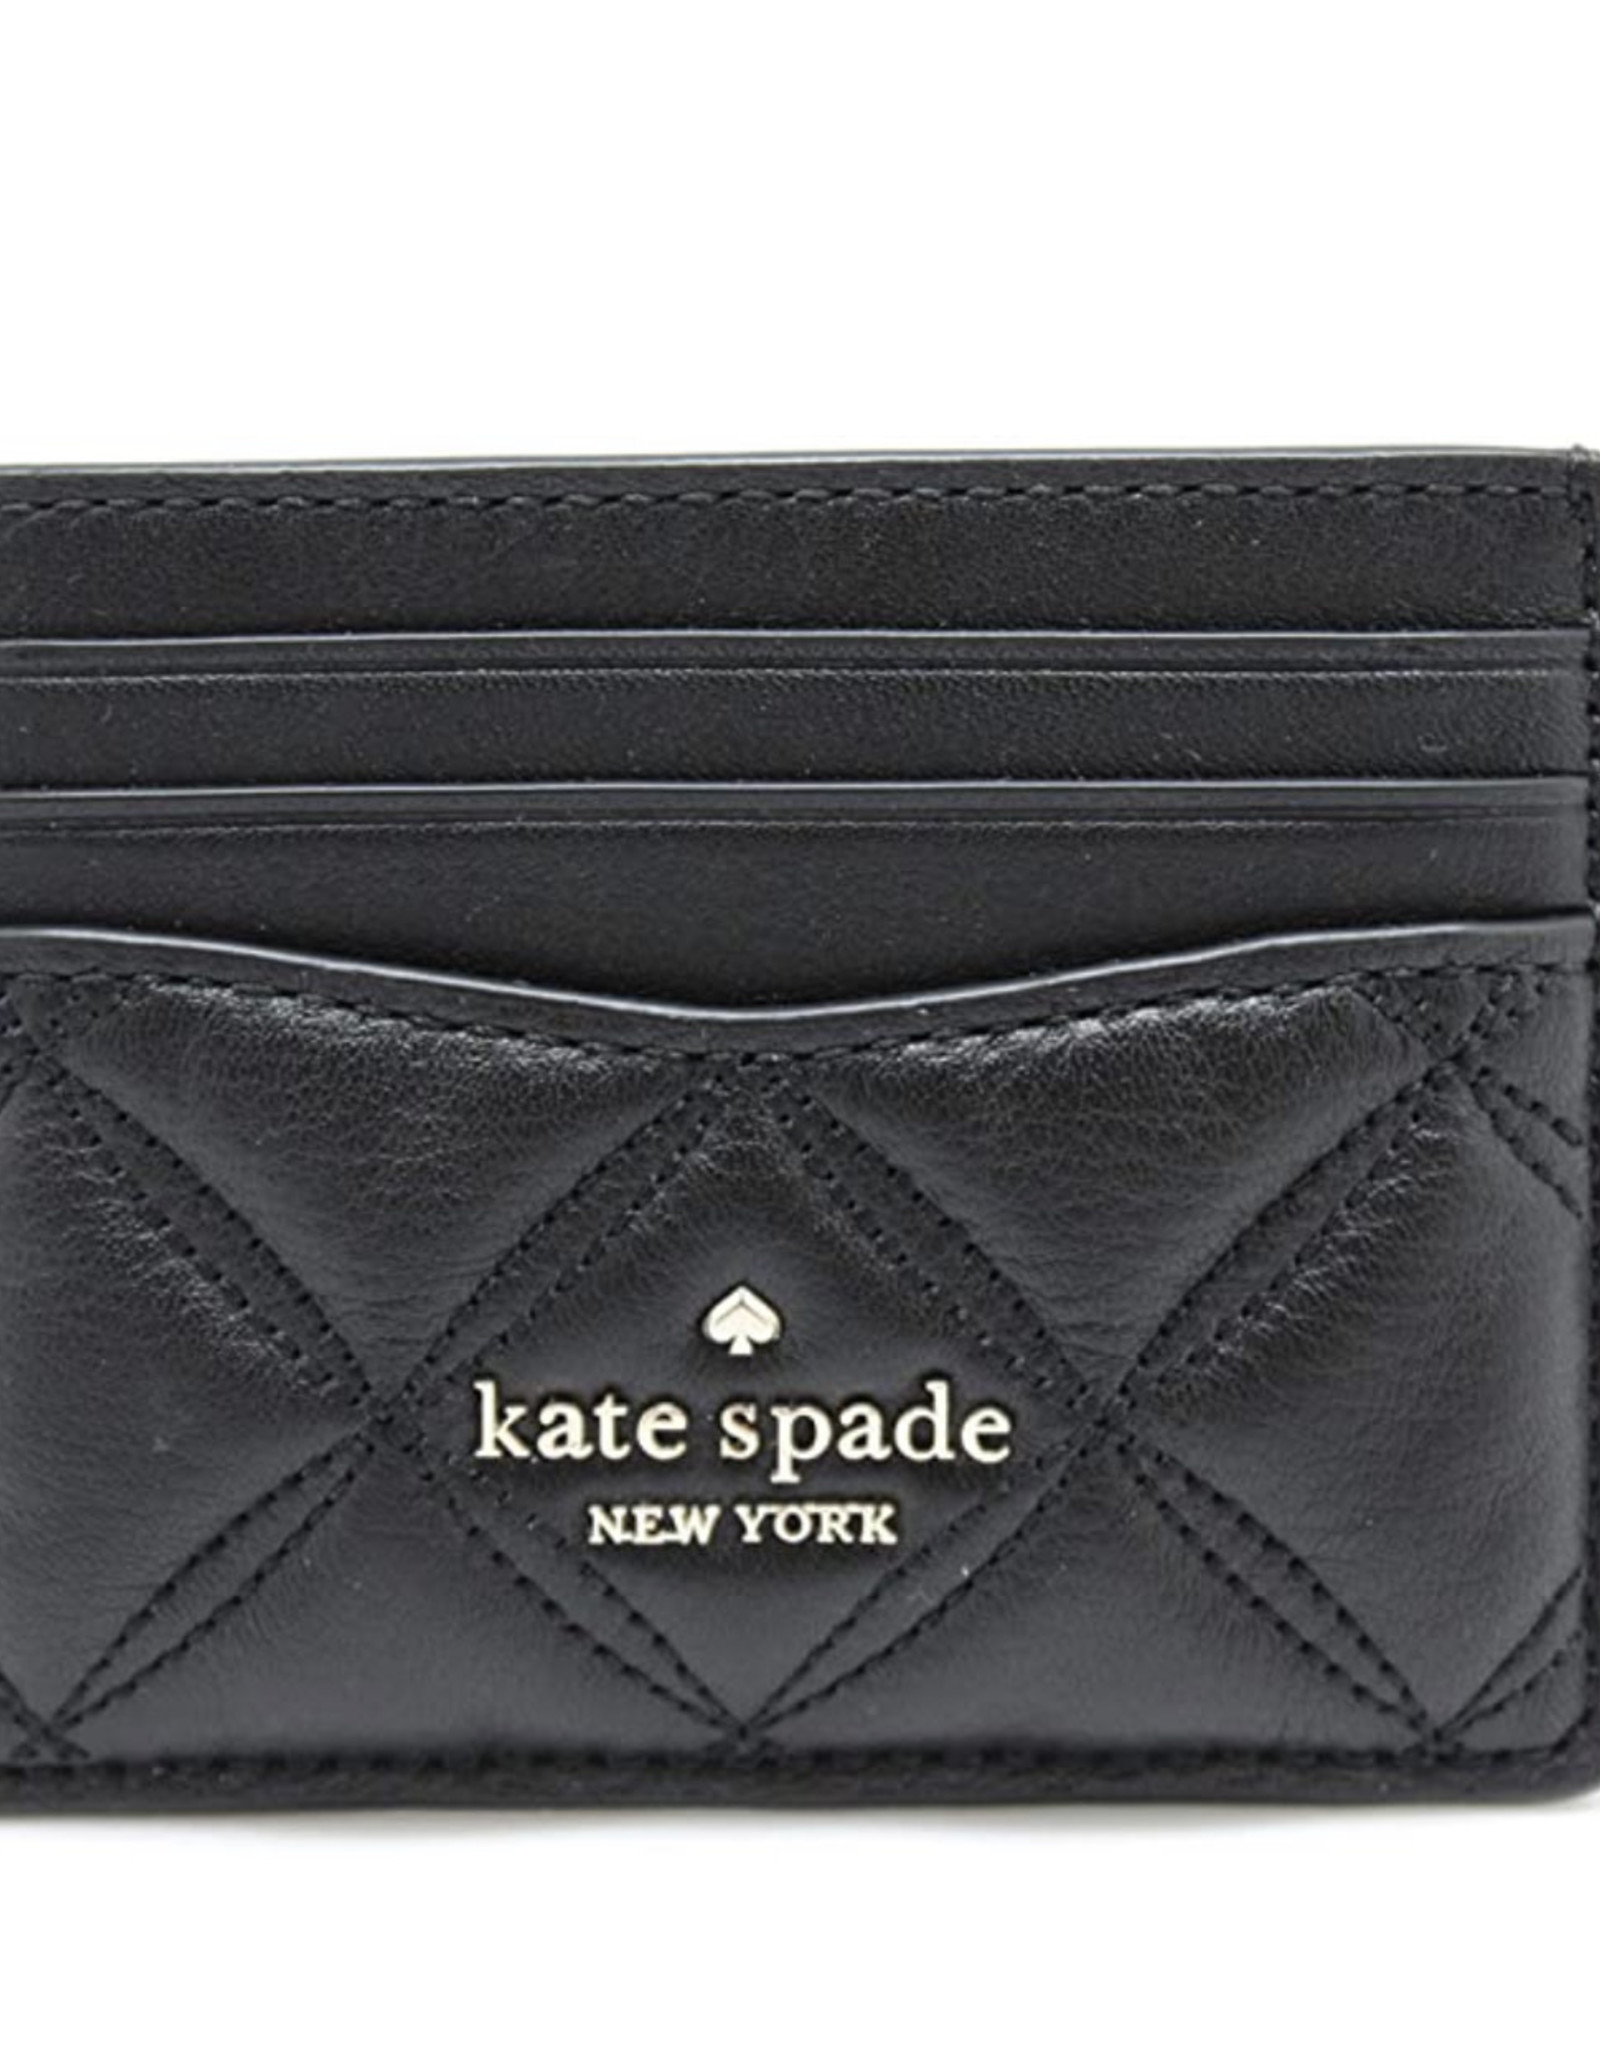 Kate Spade Kate Spade Small Slim Card Holder